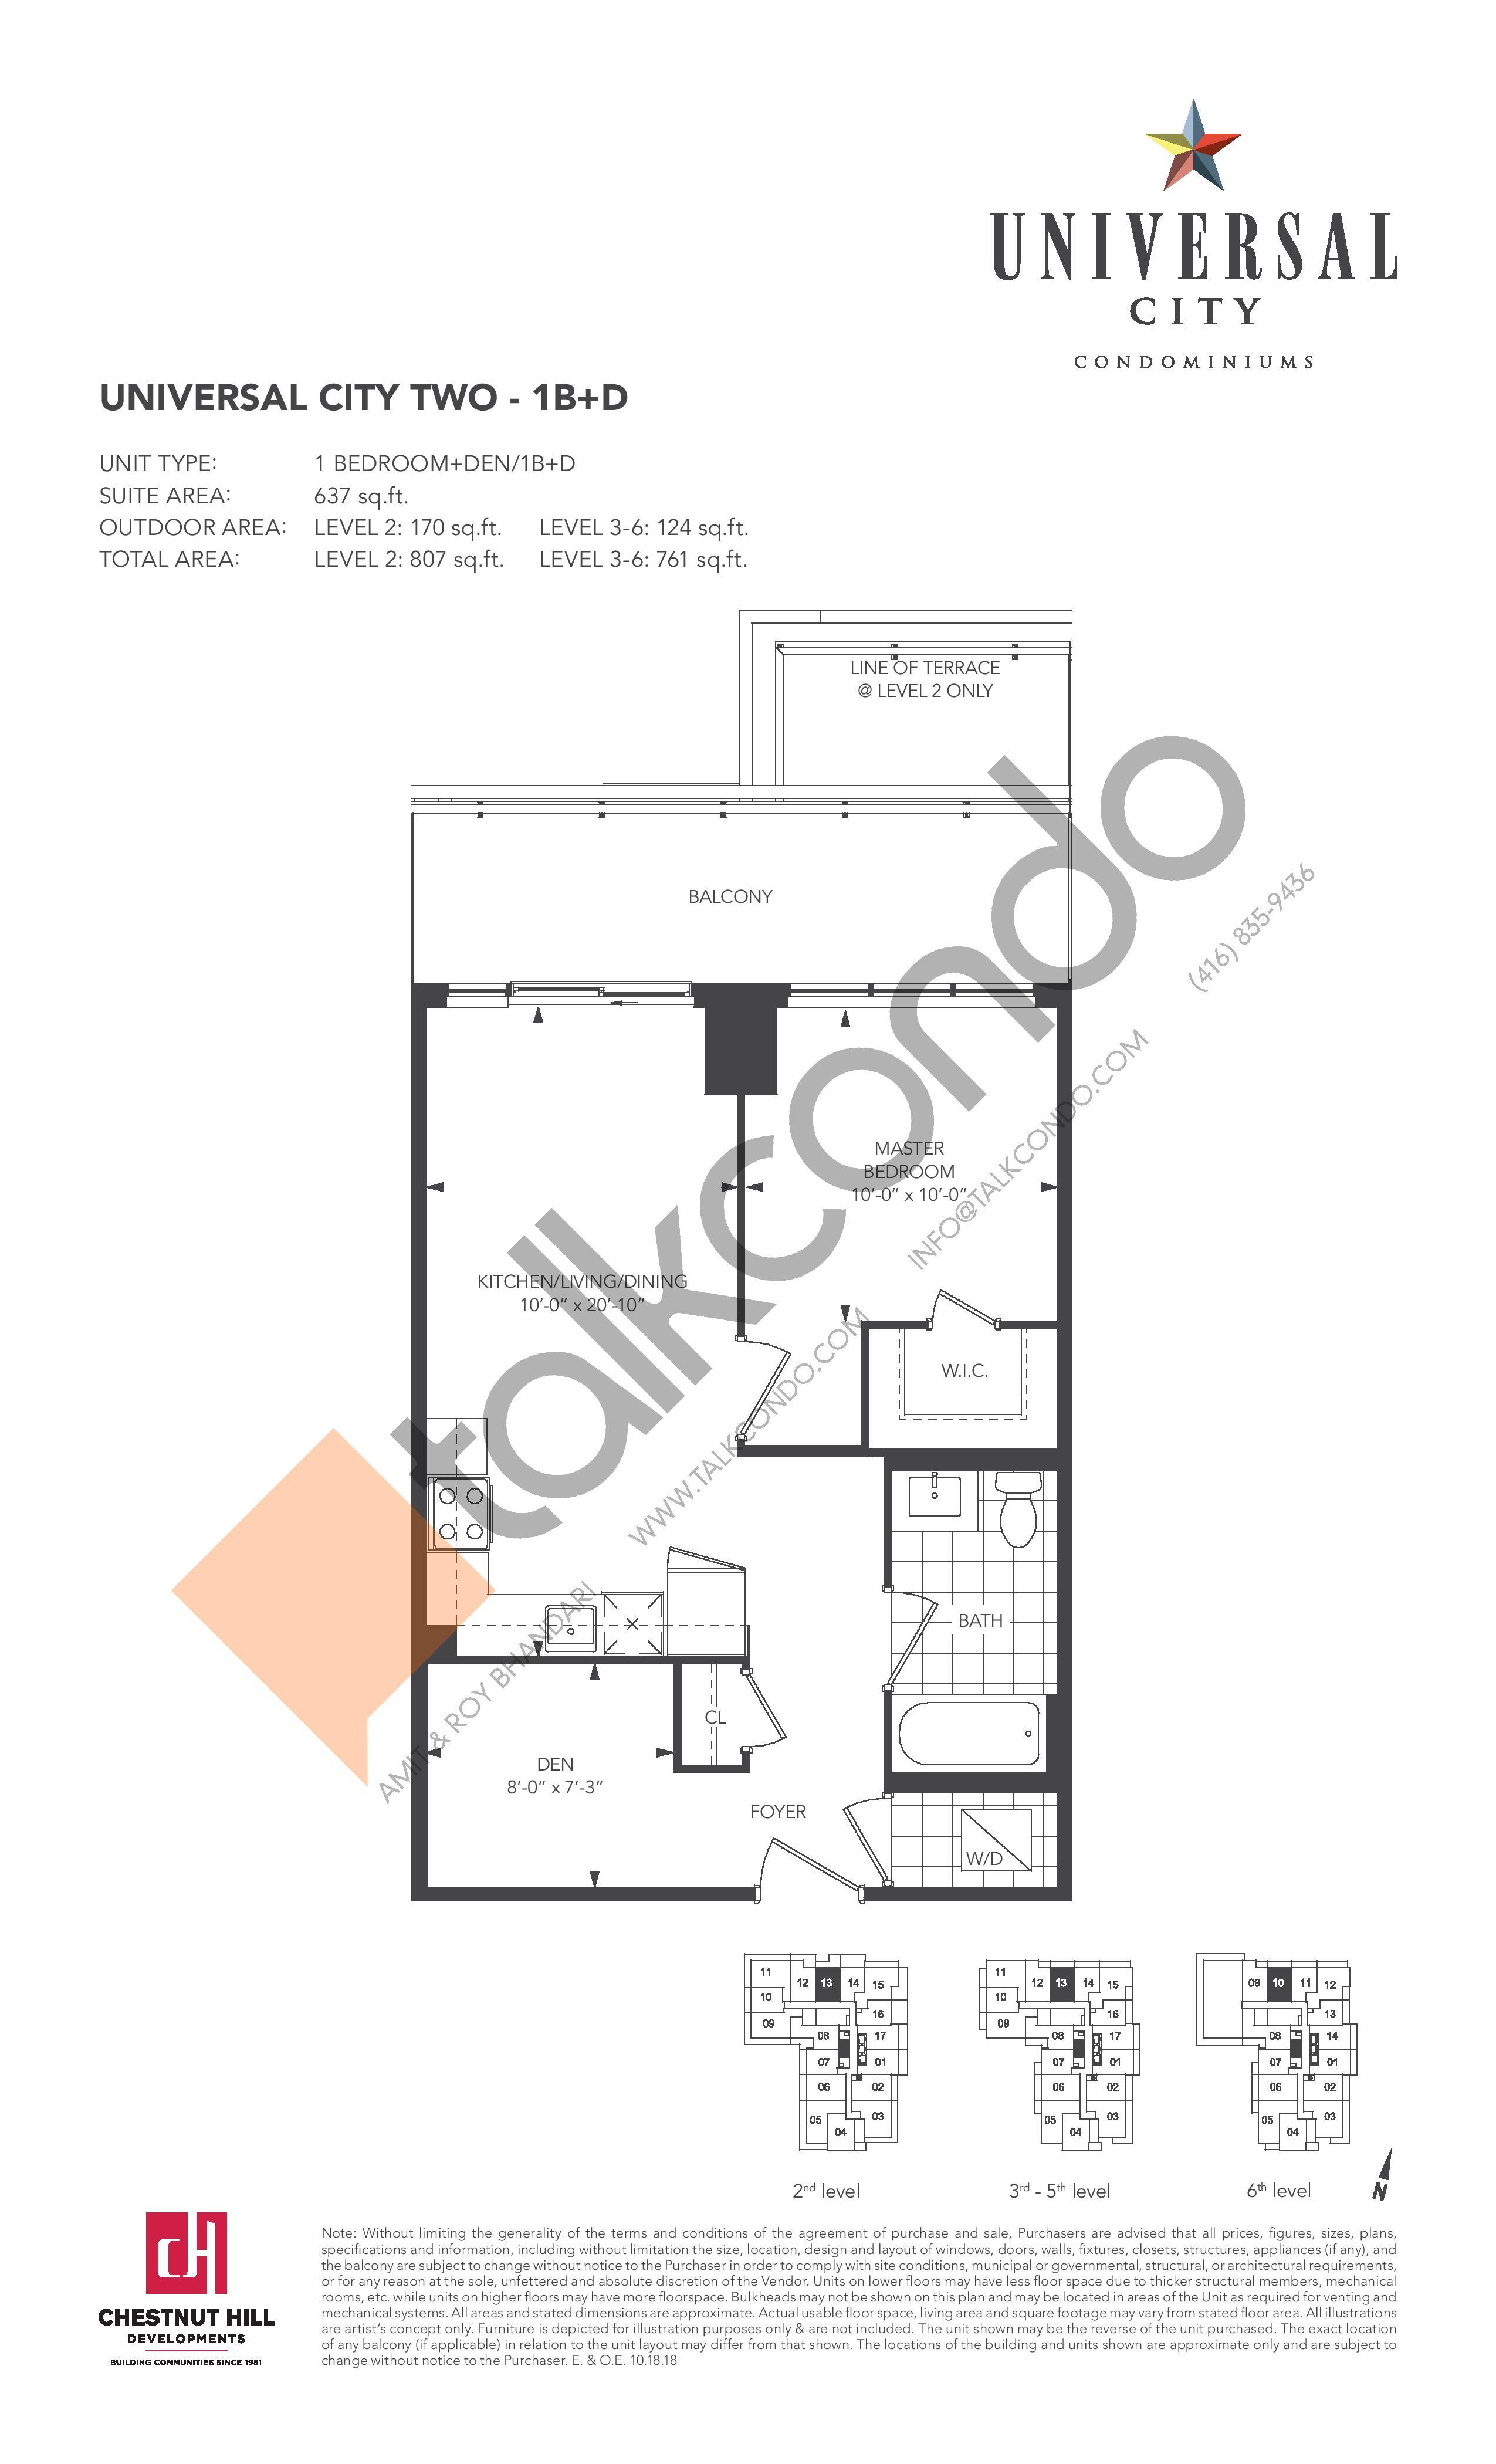 1B+D Floor Plan at Universal City 2 Condos - 637 sq.ft